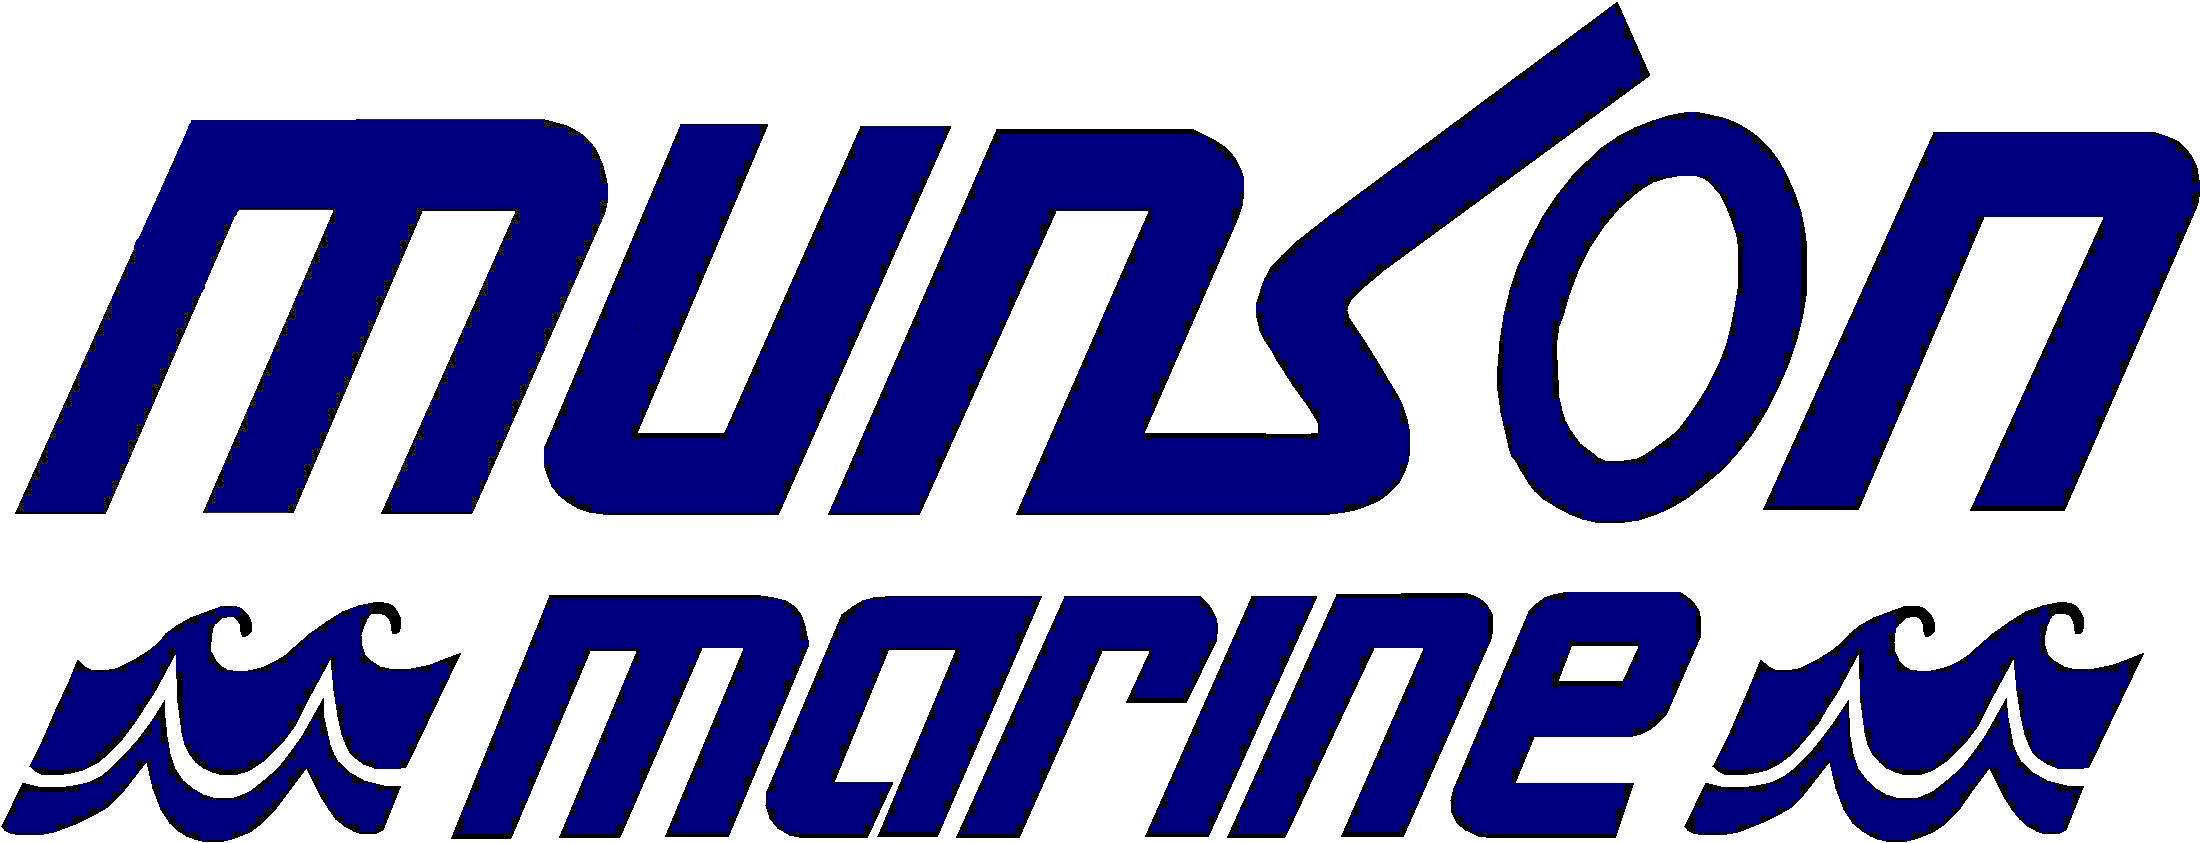 742888_logo